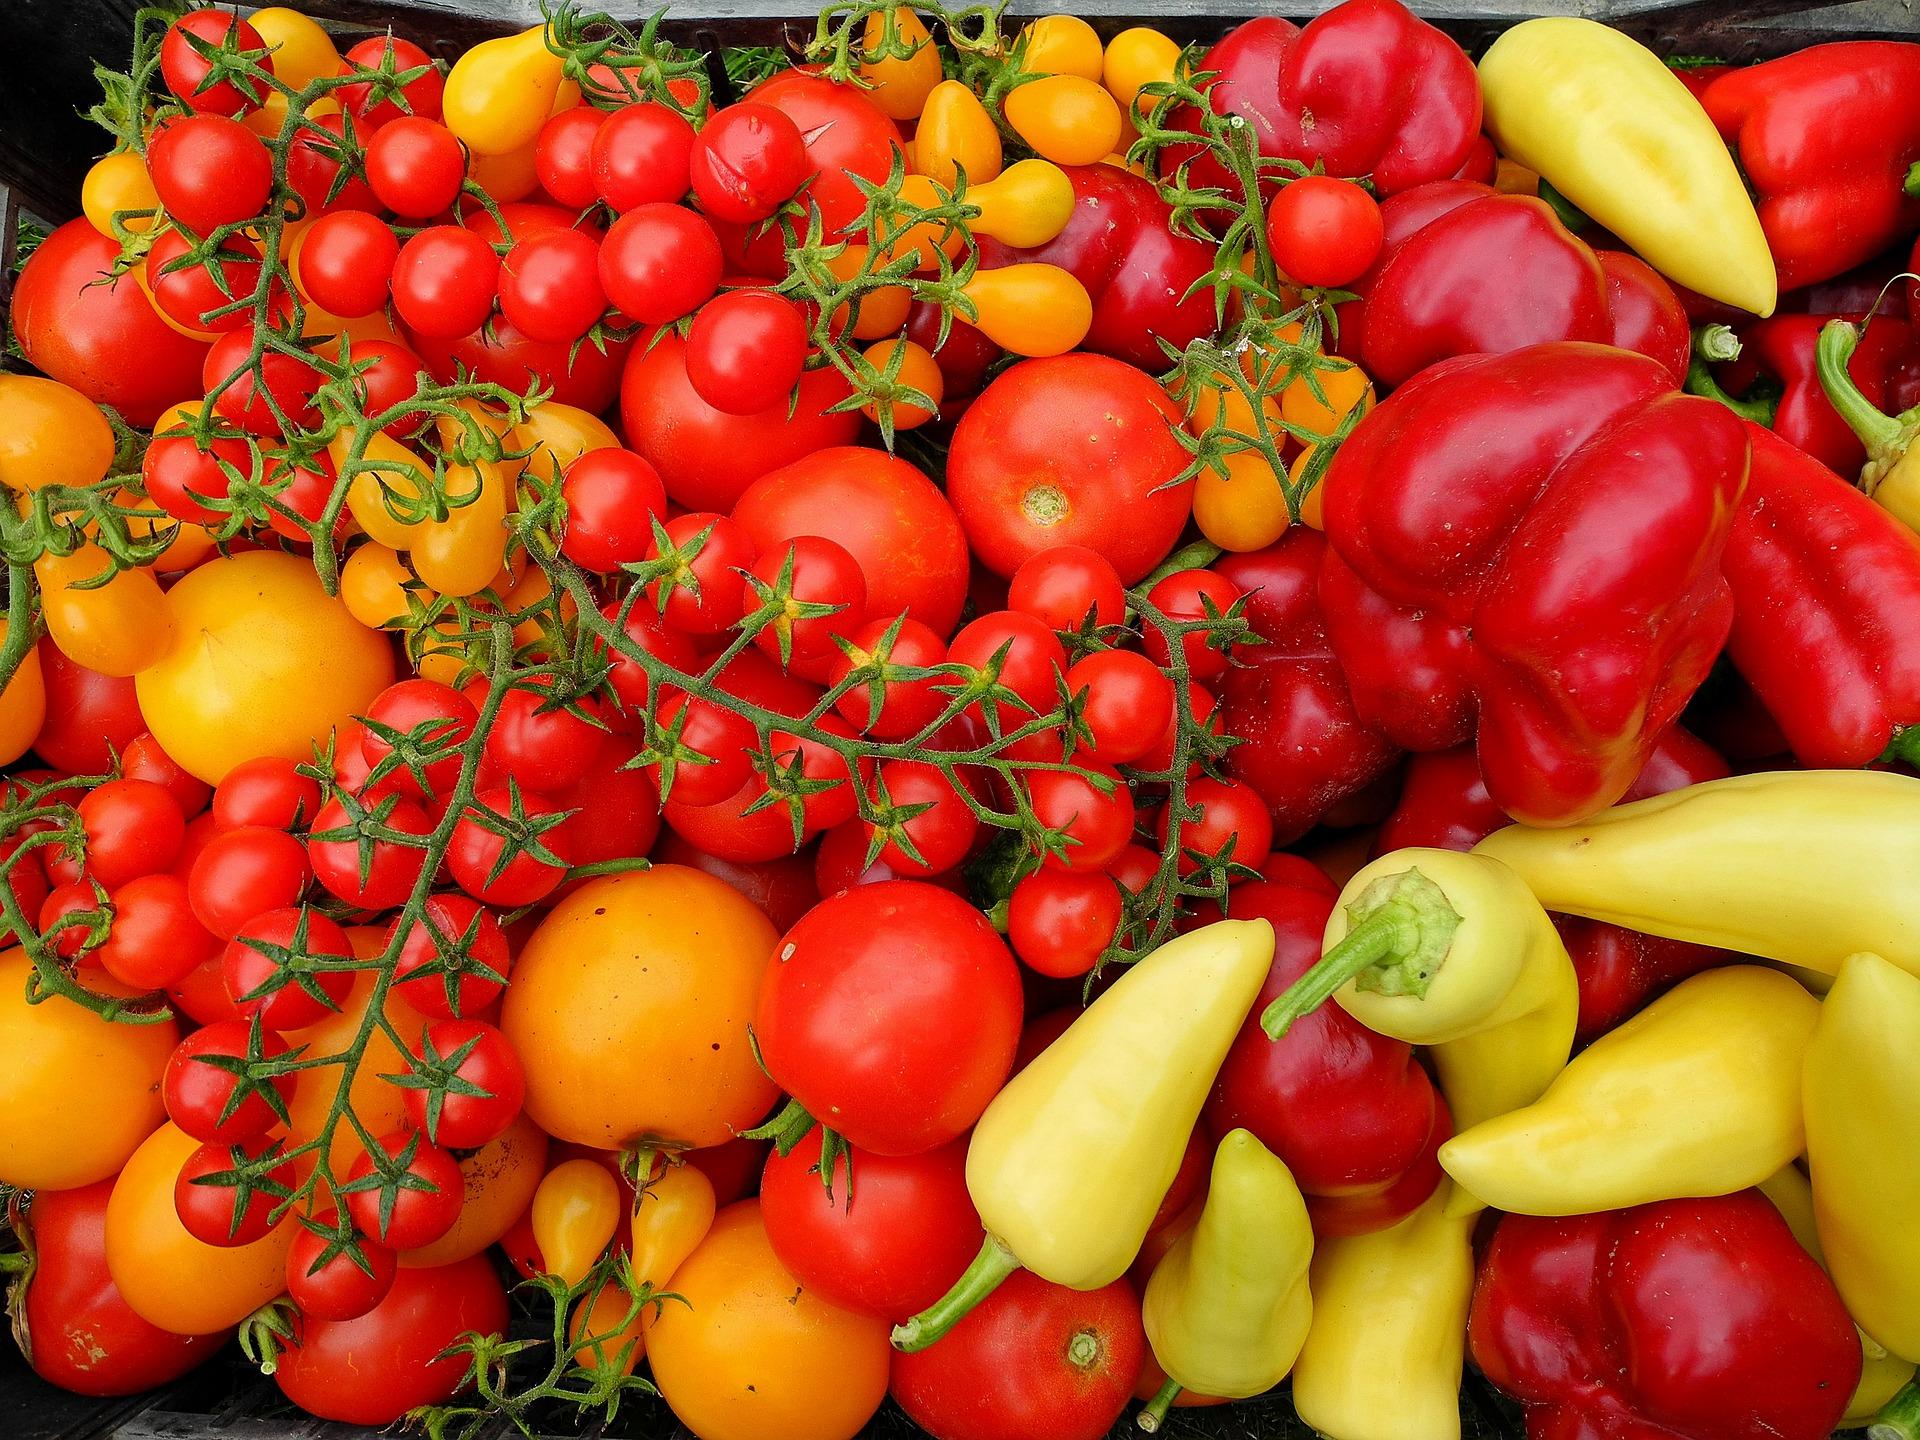 tomatoes-2768123_1920